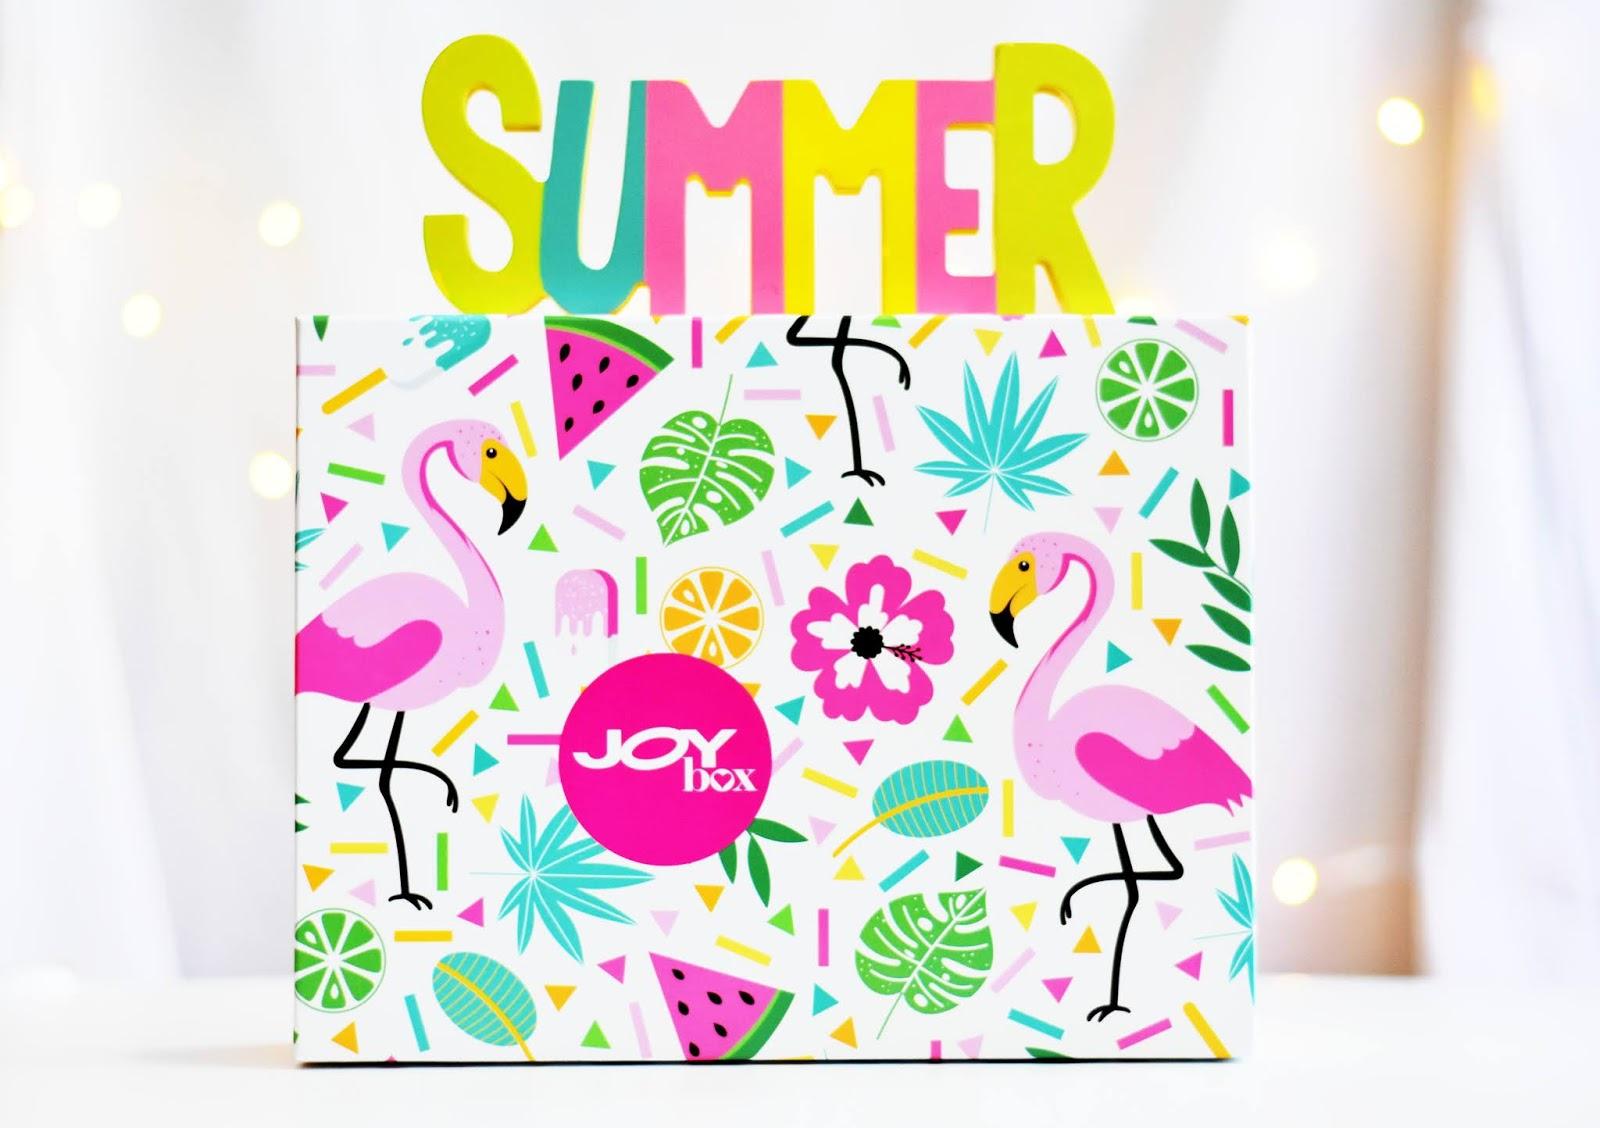 joybox wakacje 2018